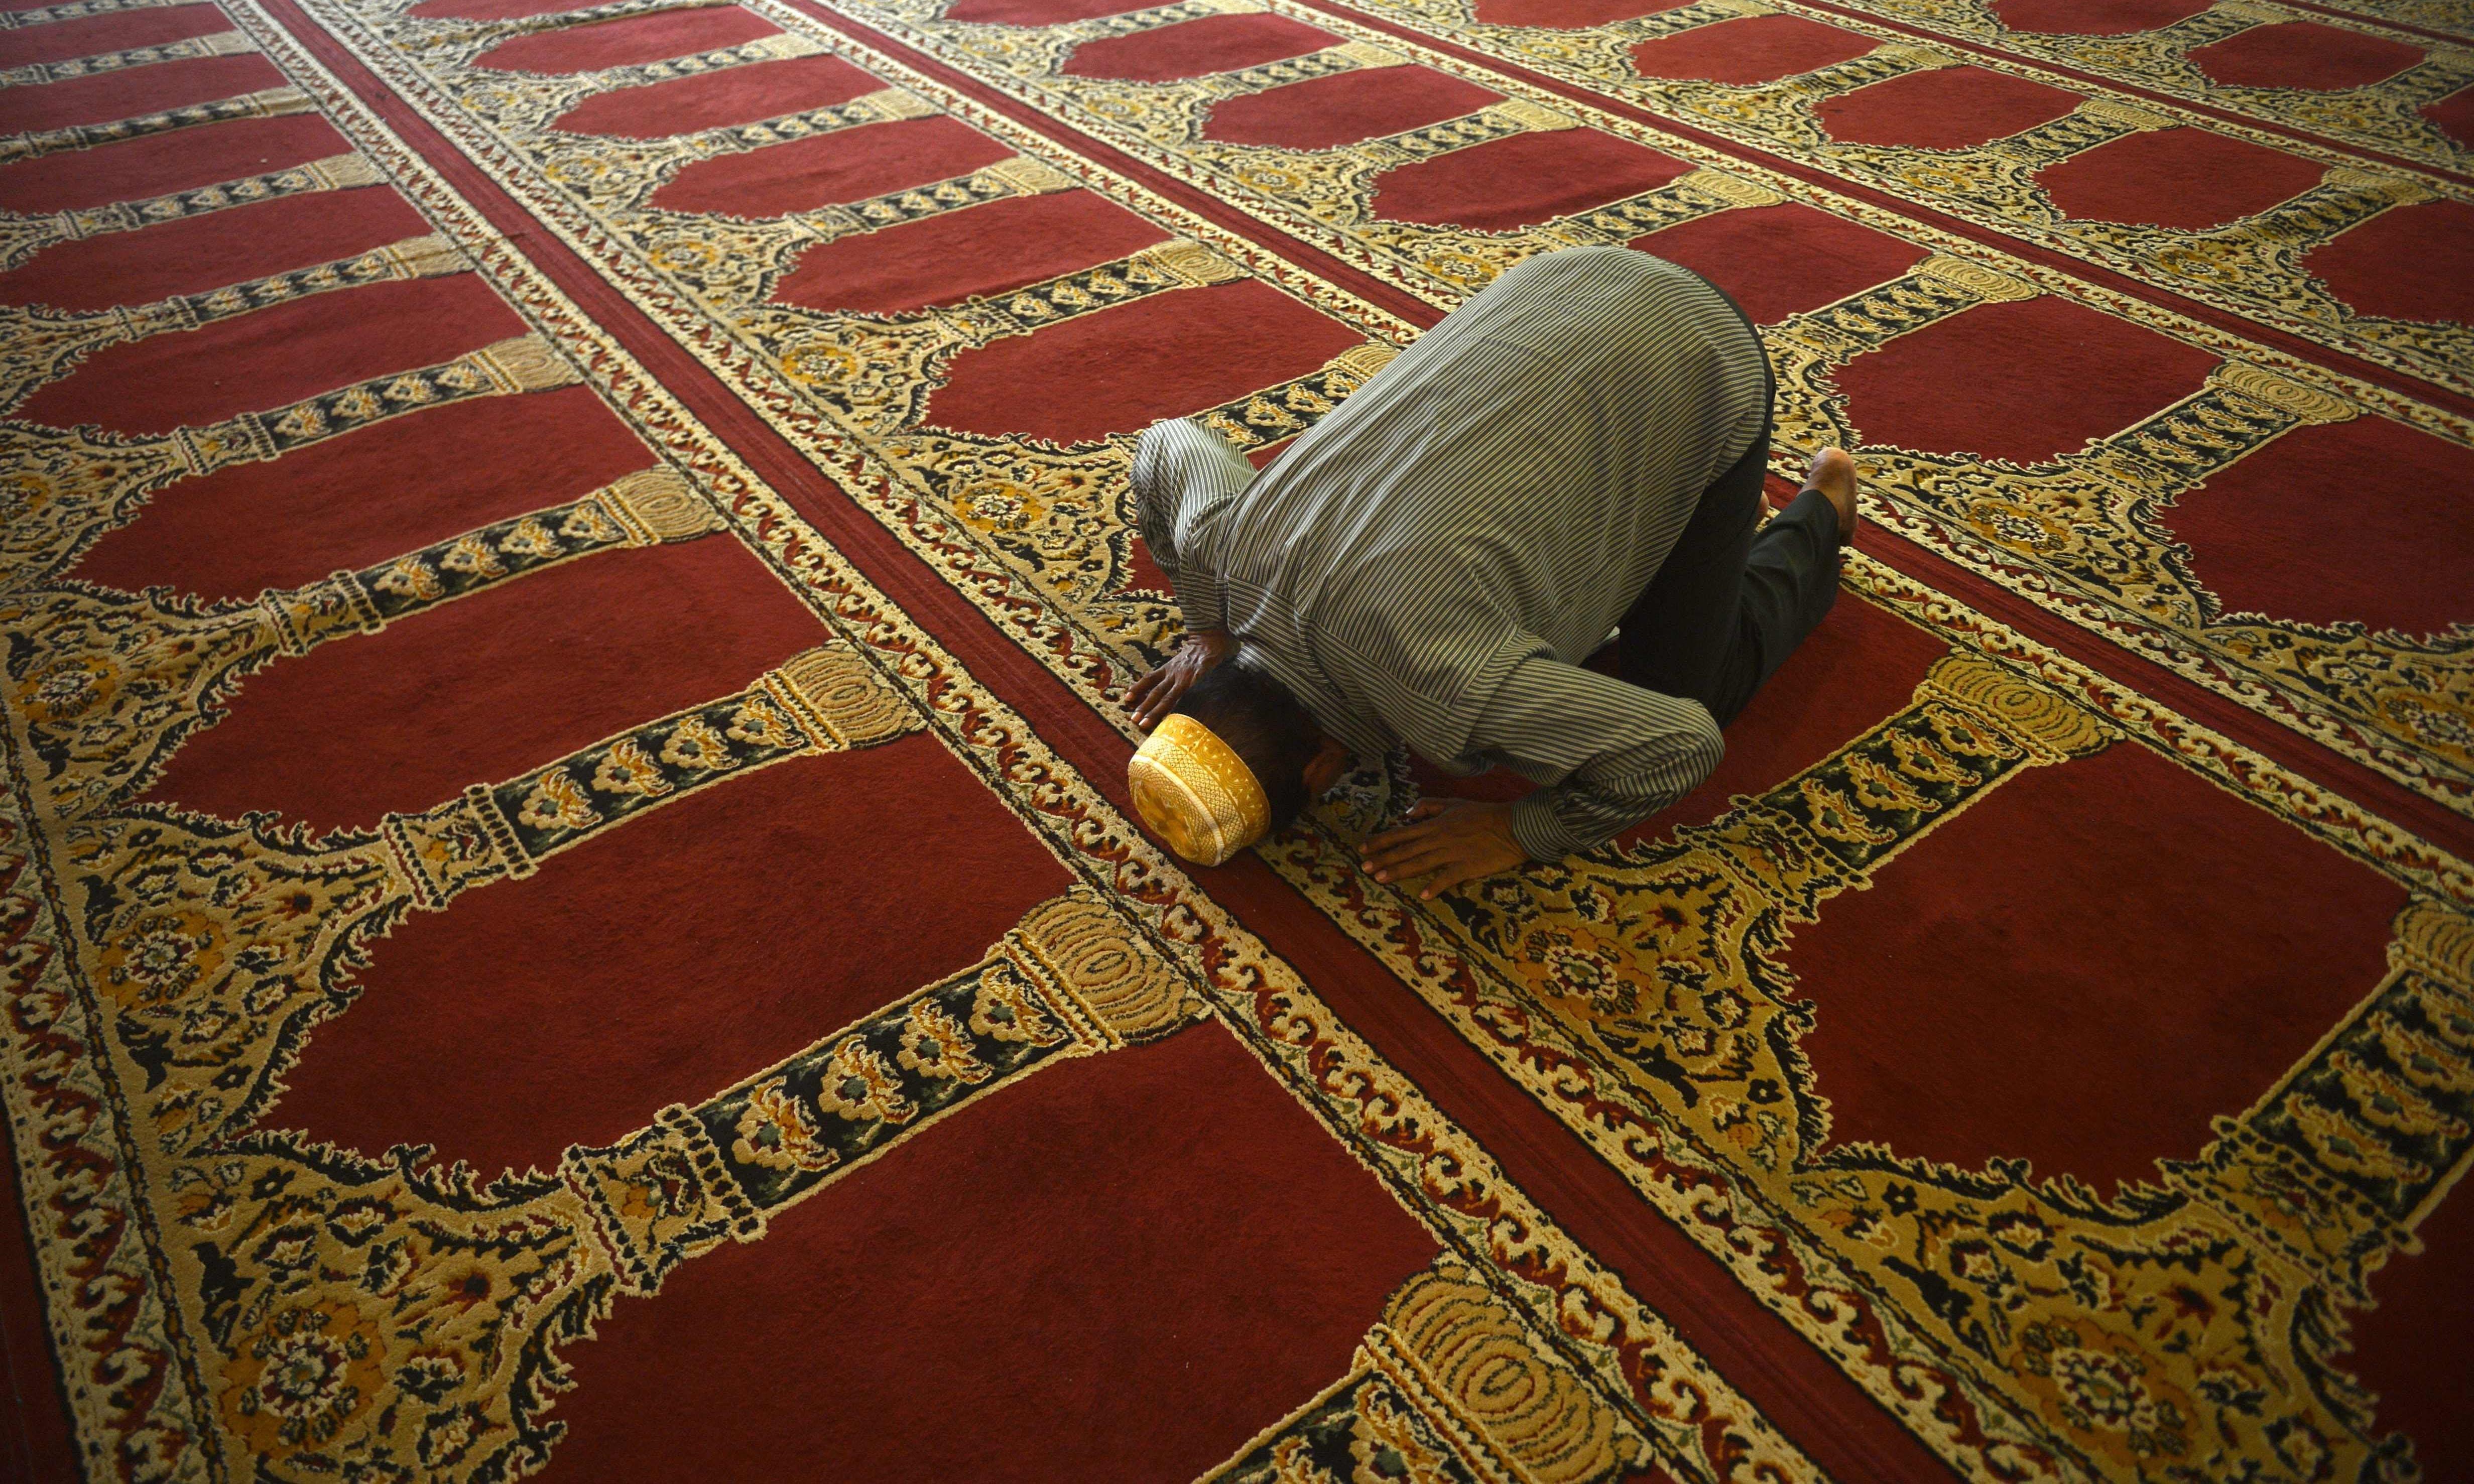 A Sri Lankan Muslim man prays at the Dawatagaha Jumma Masjid during Friday noon prayers in Colombo. — AFP